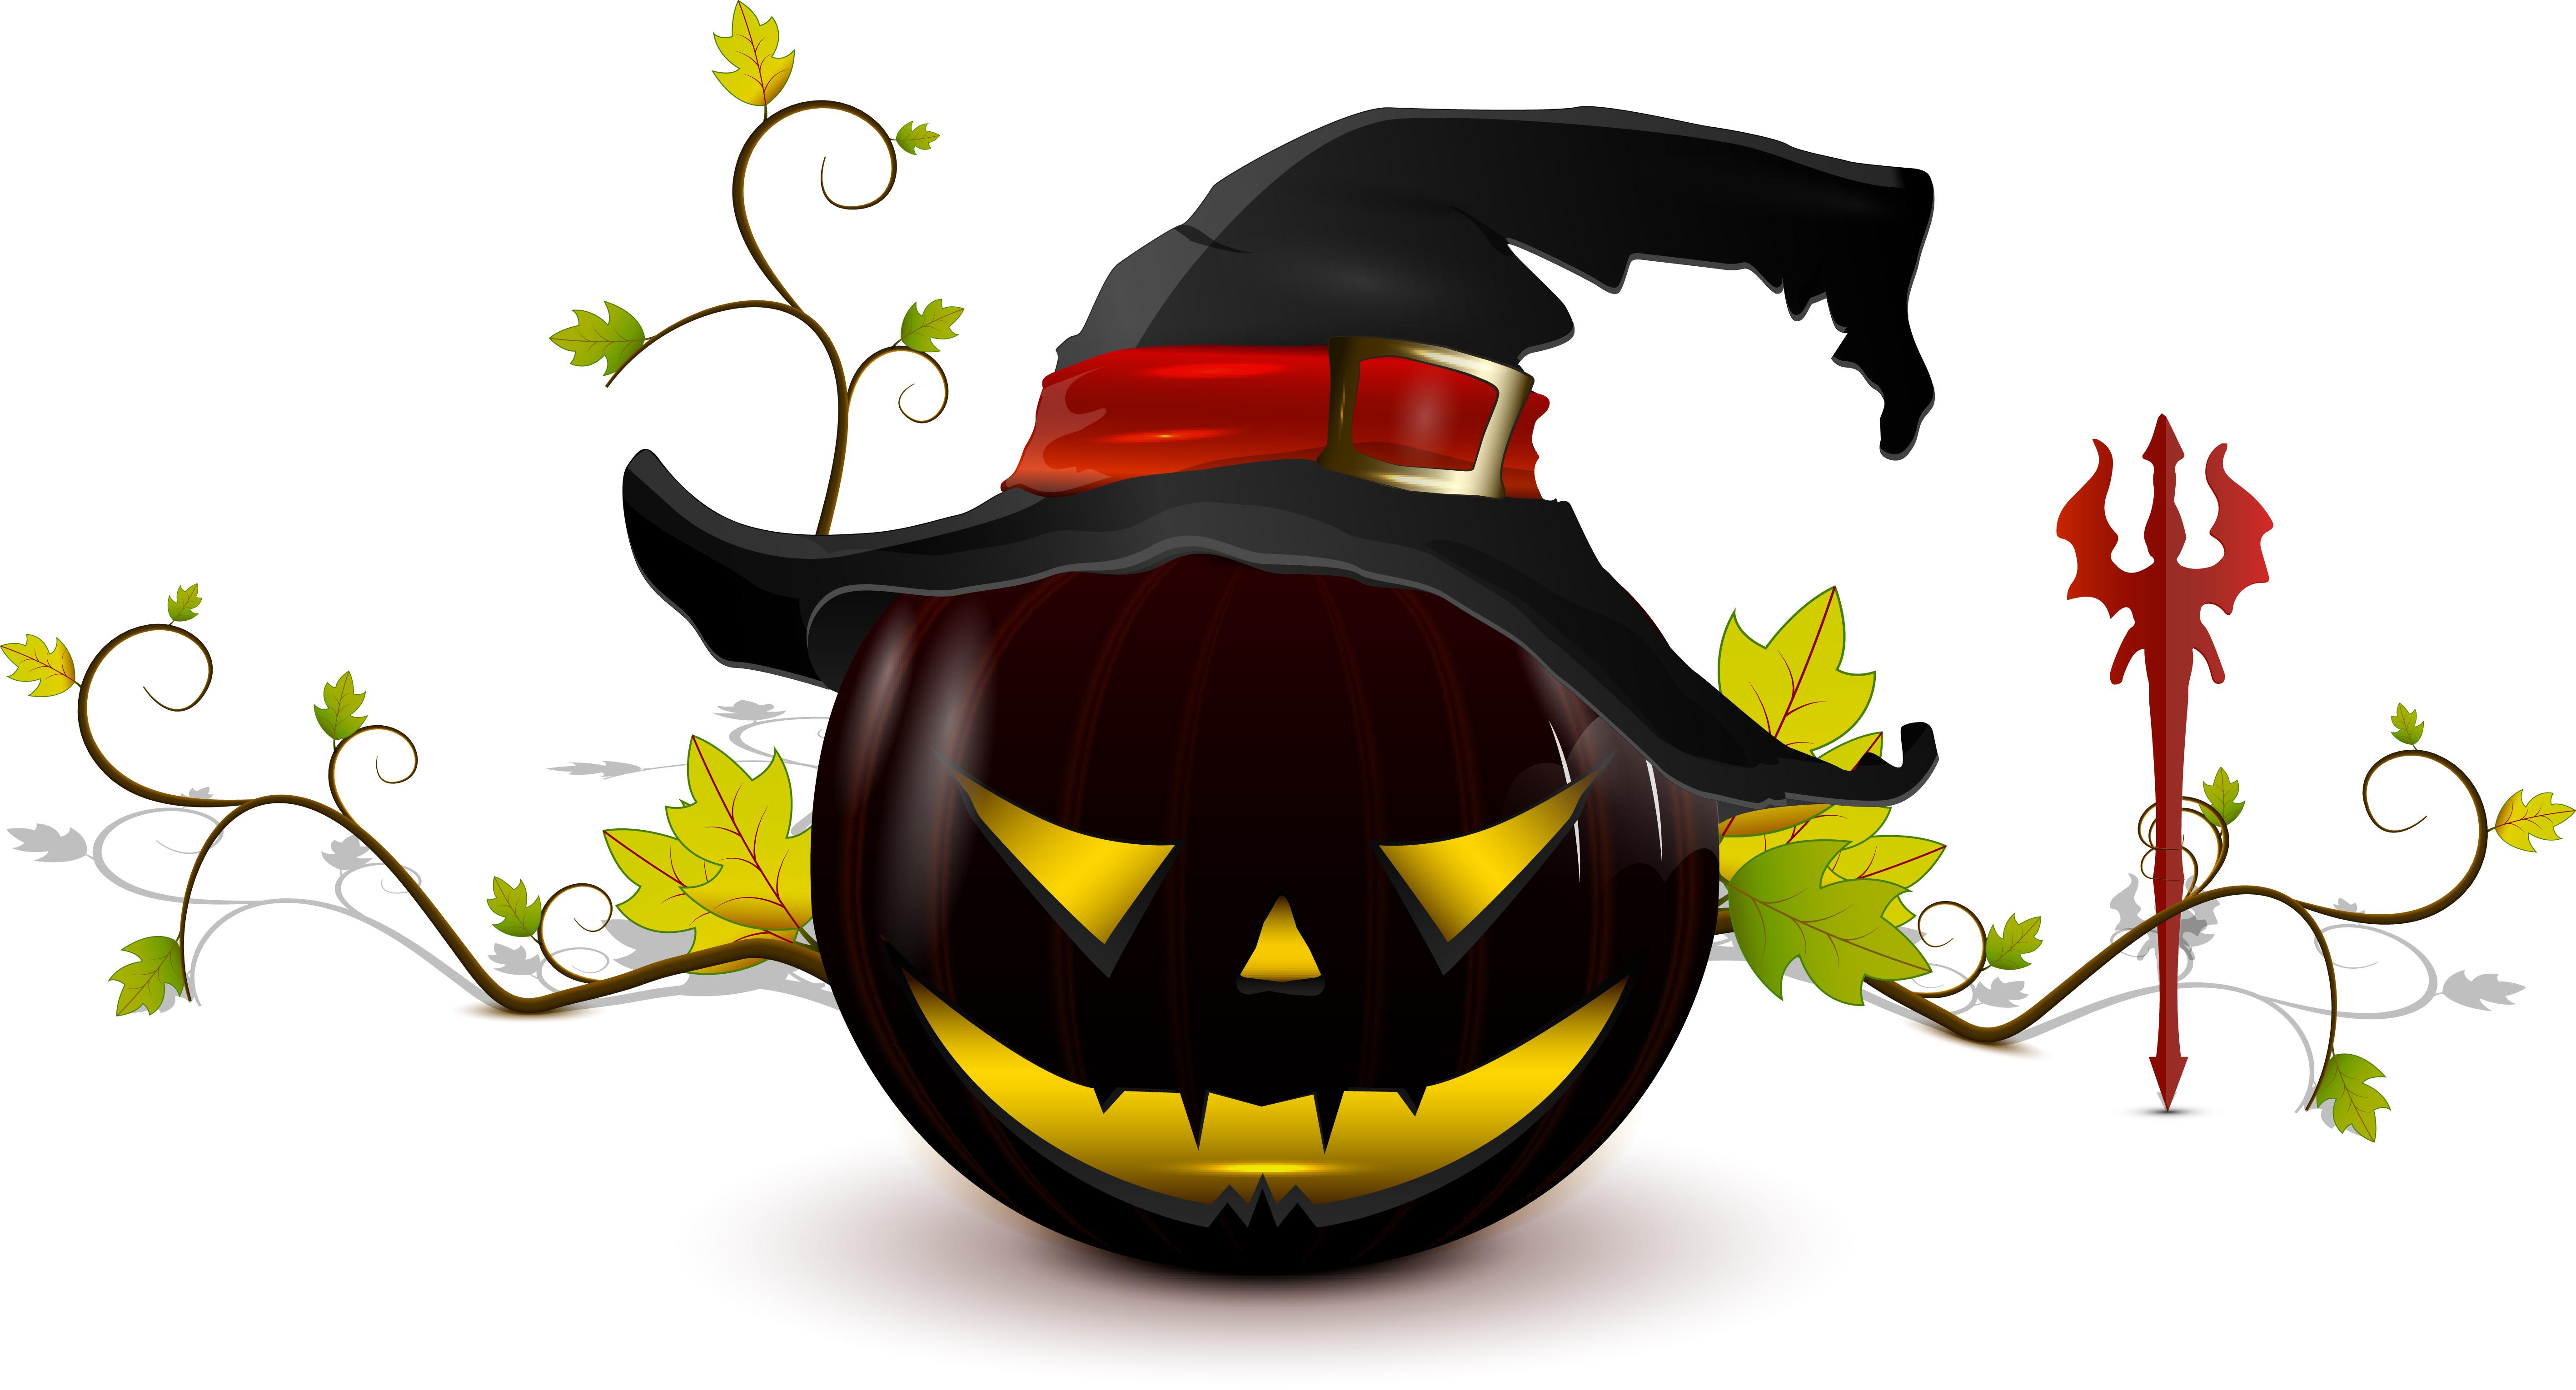 графика хэллоуин graphics Halloween без смс